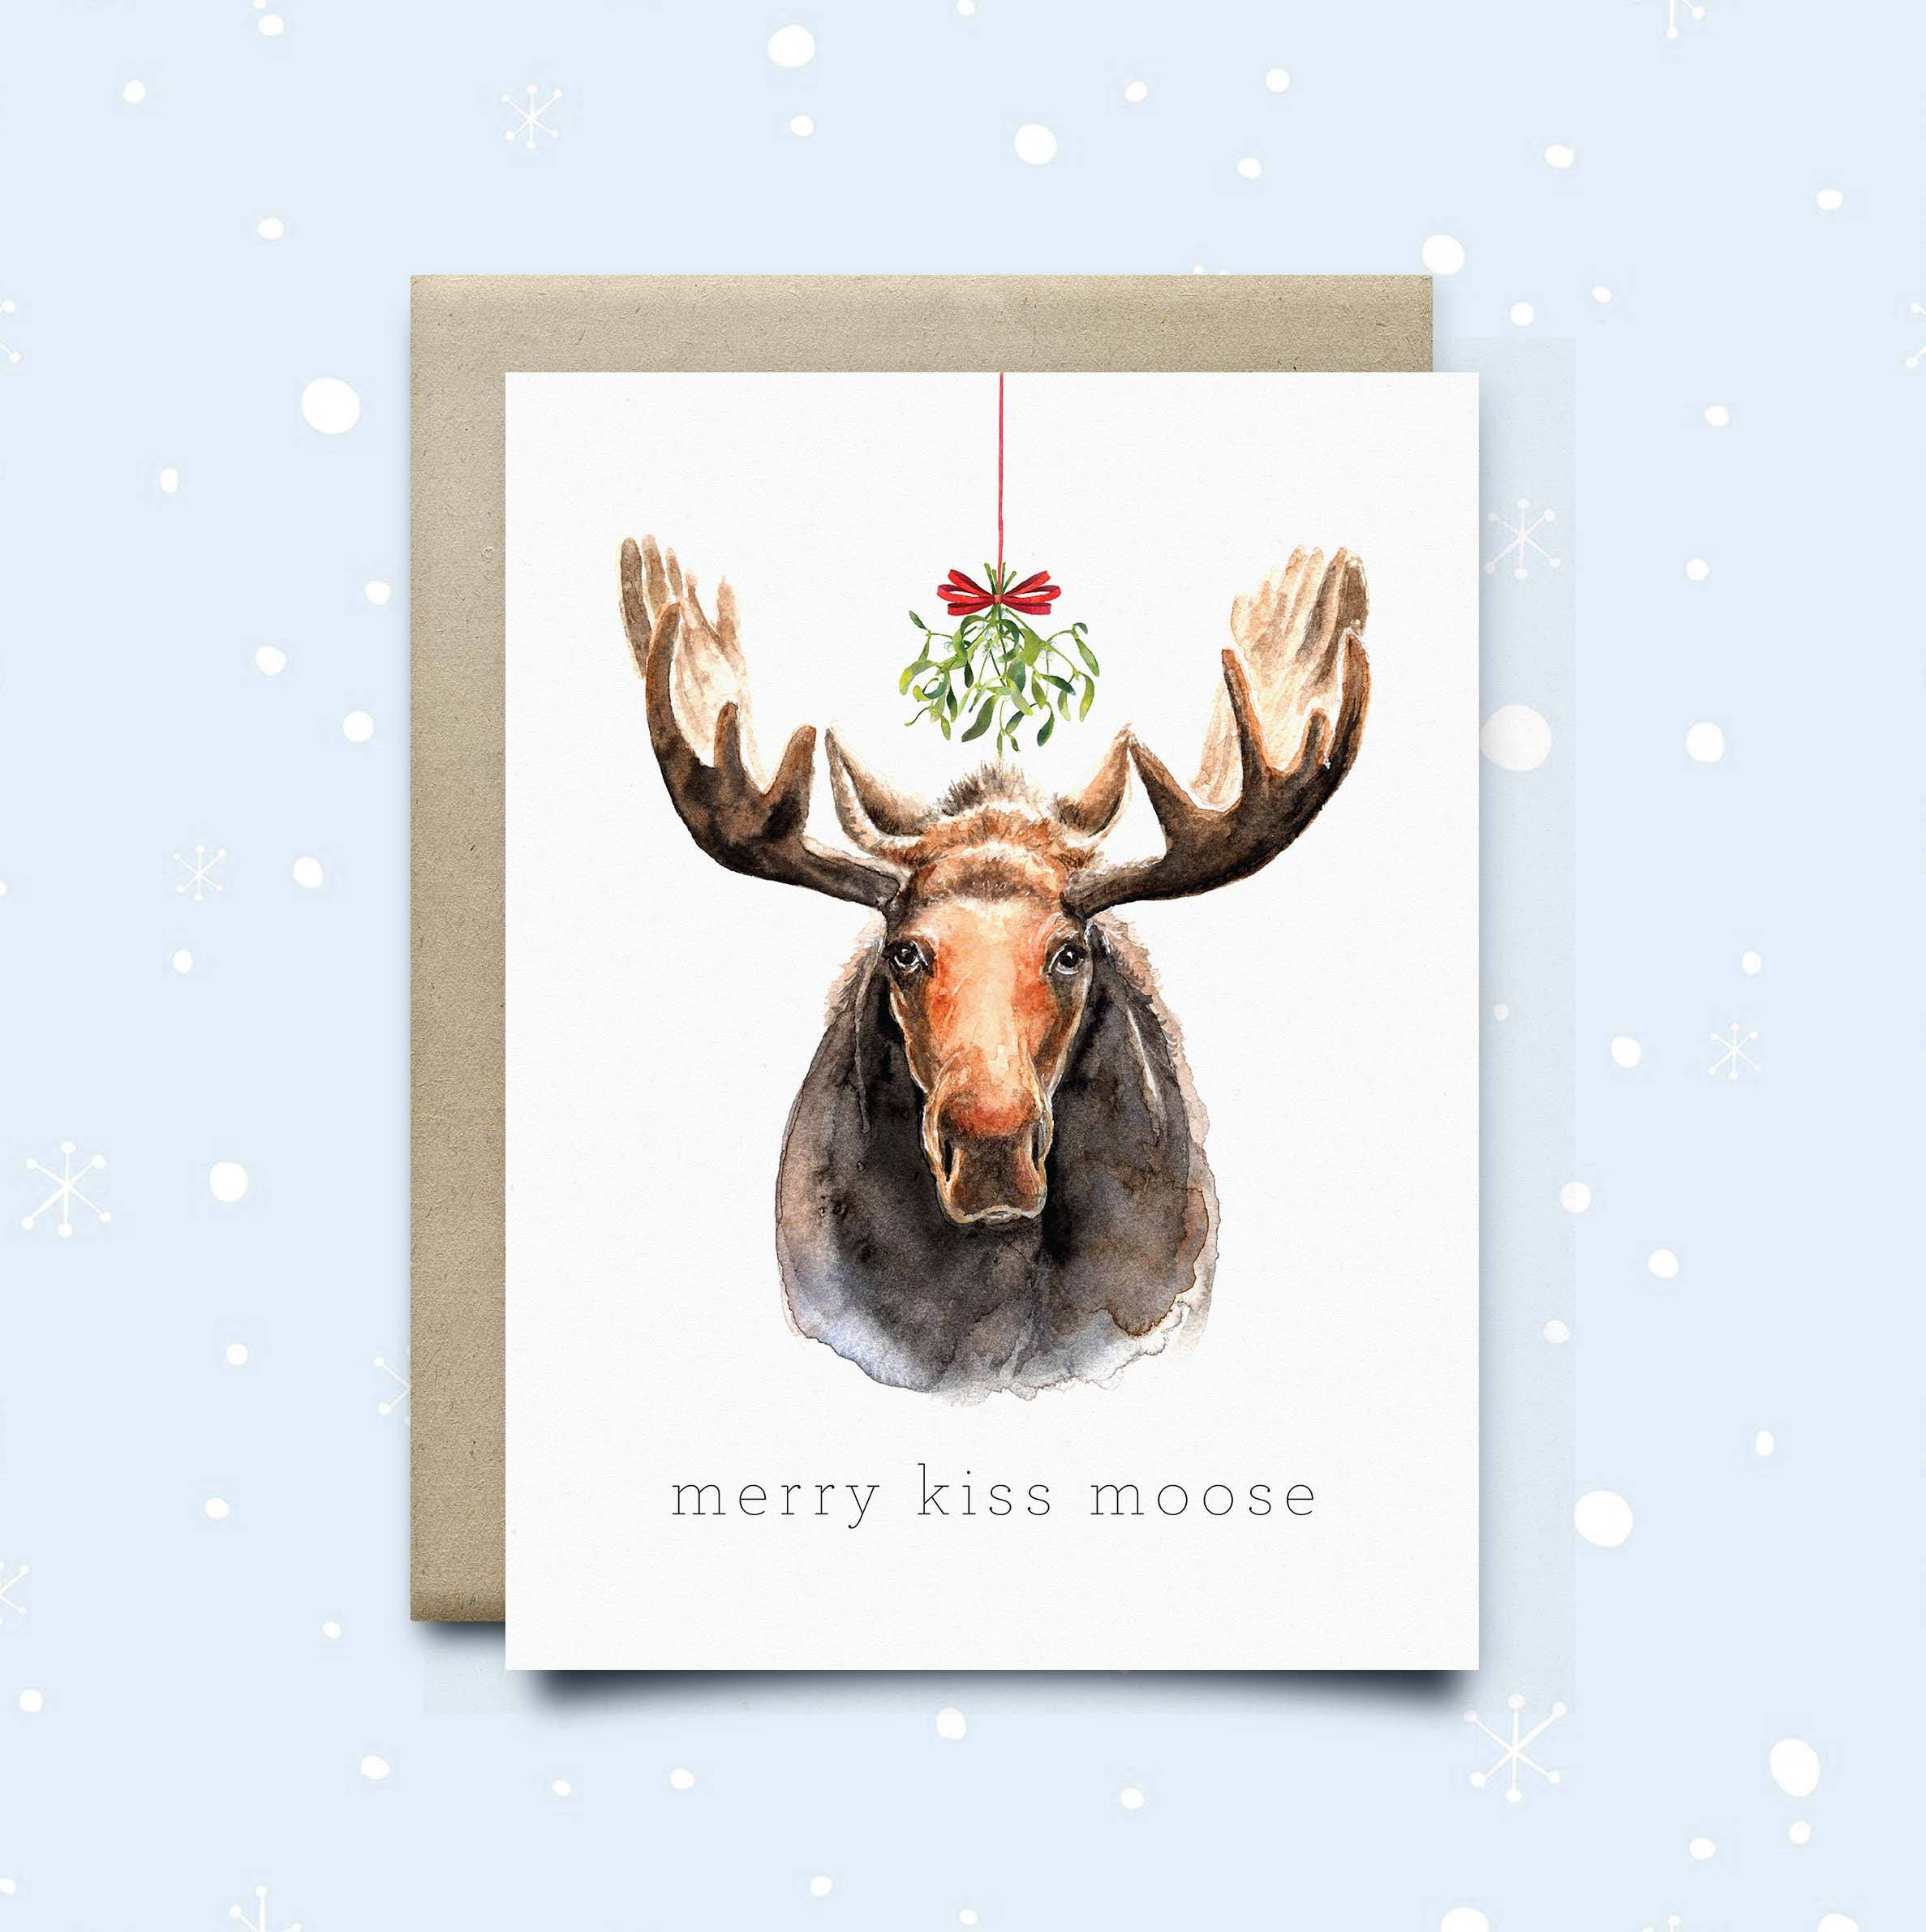 Moose Christmas Card Merry Kiss Moose Holiday | Etsy